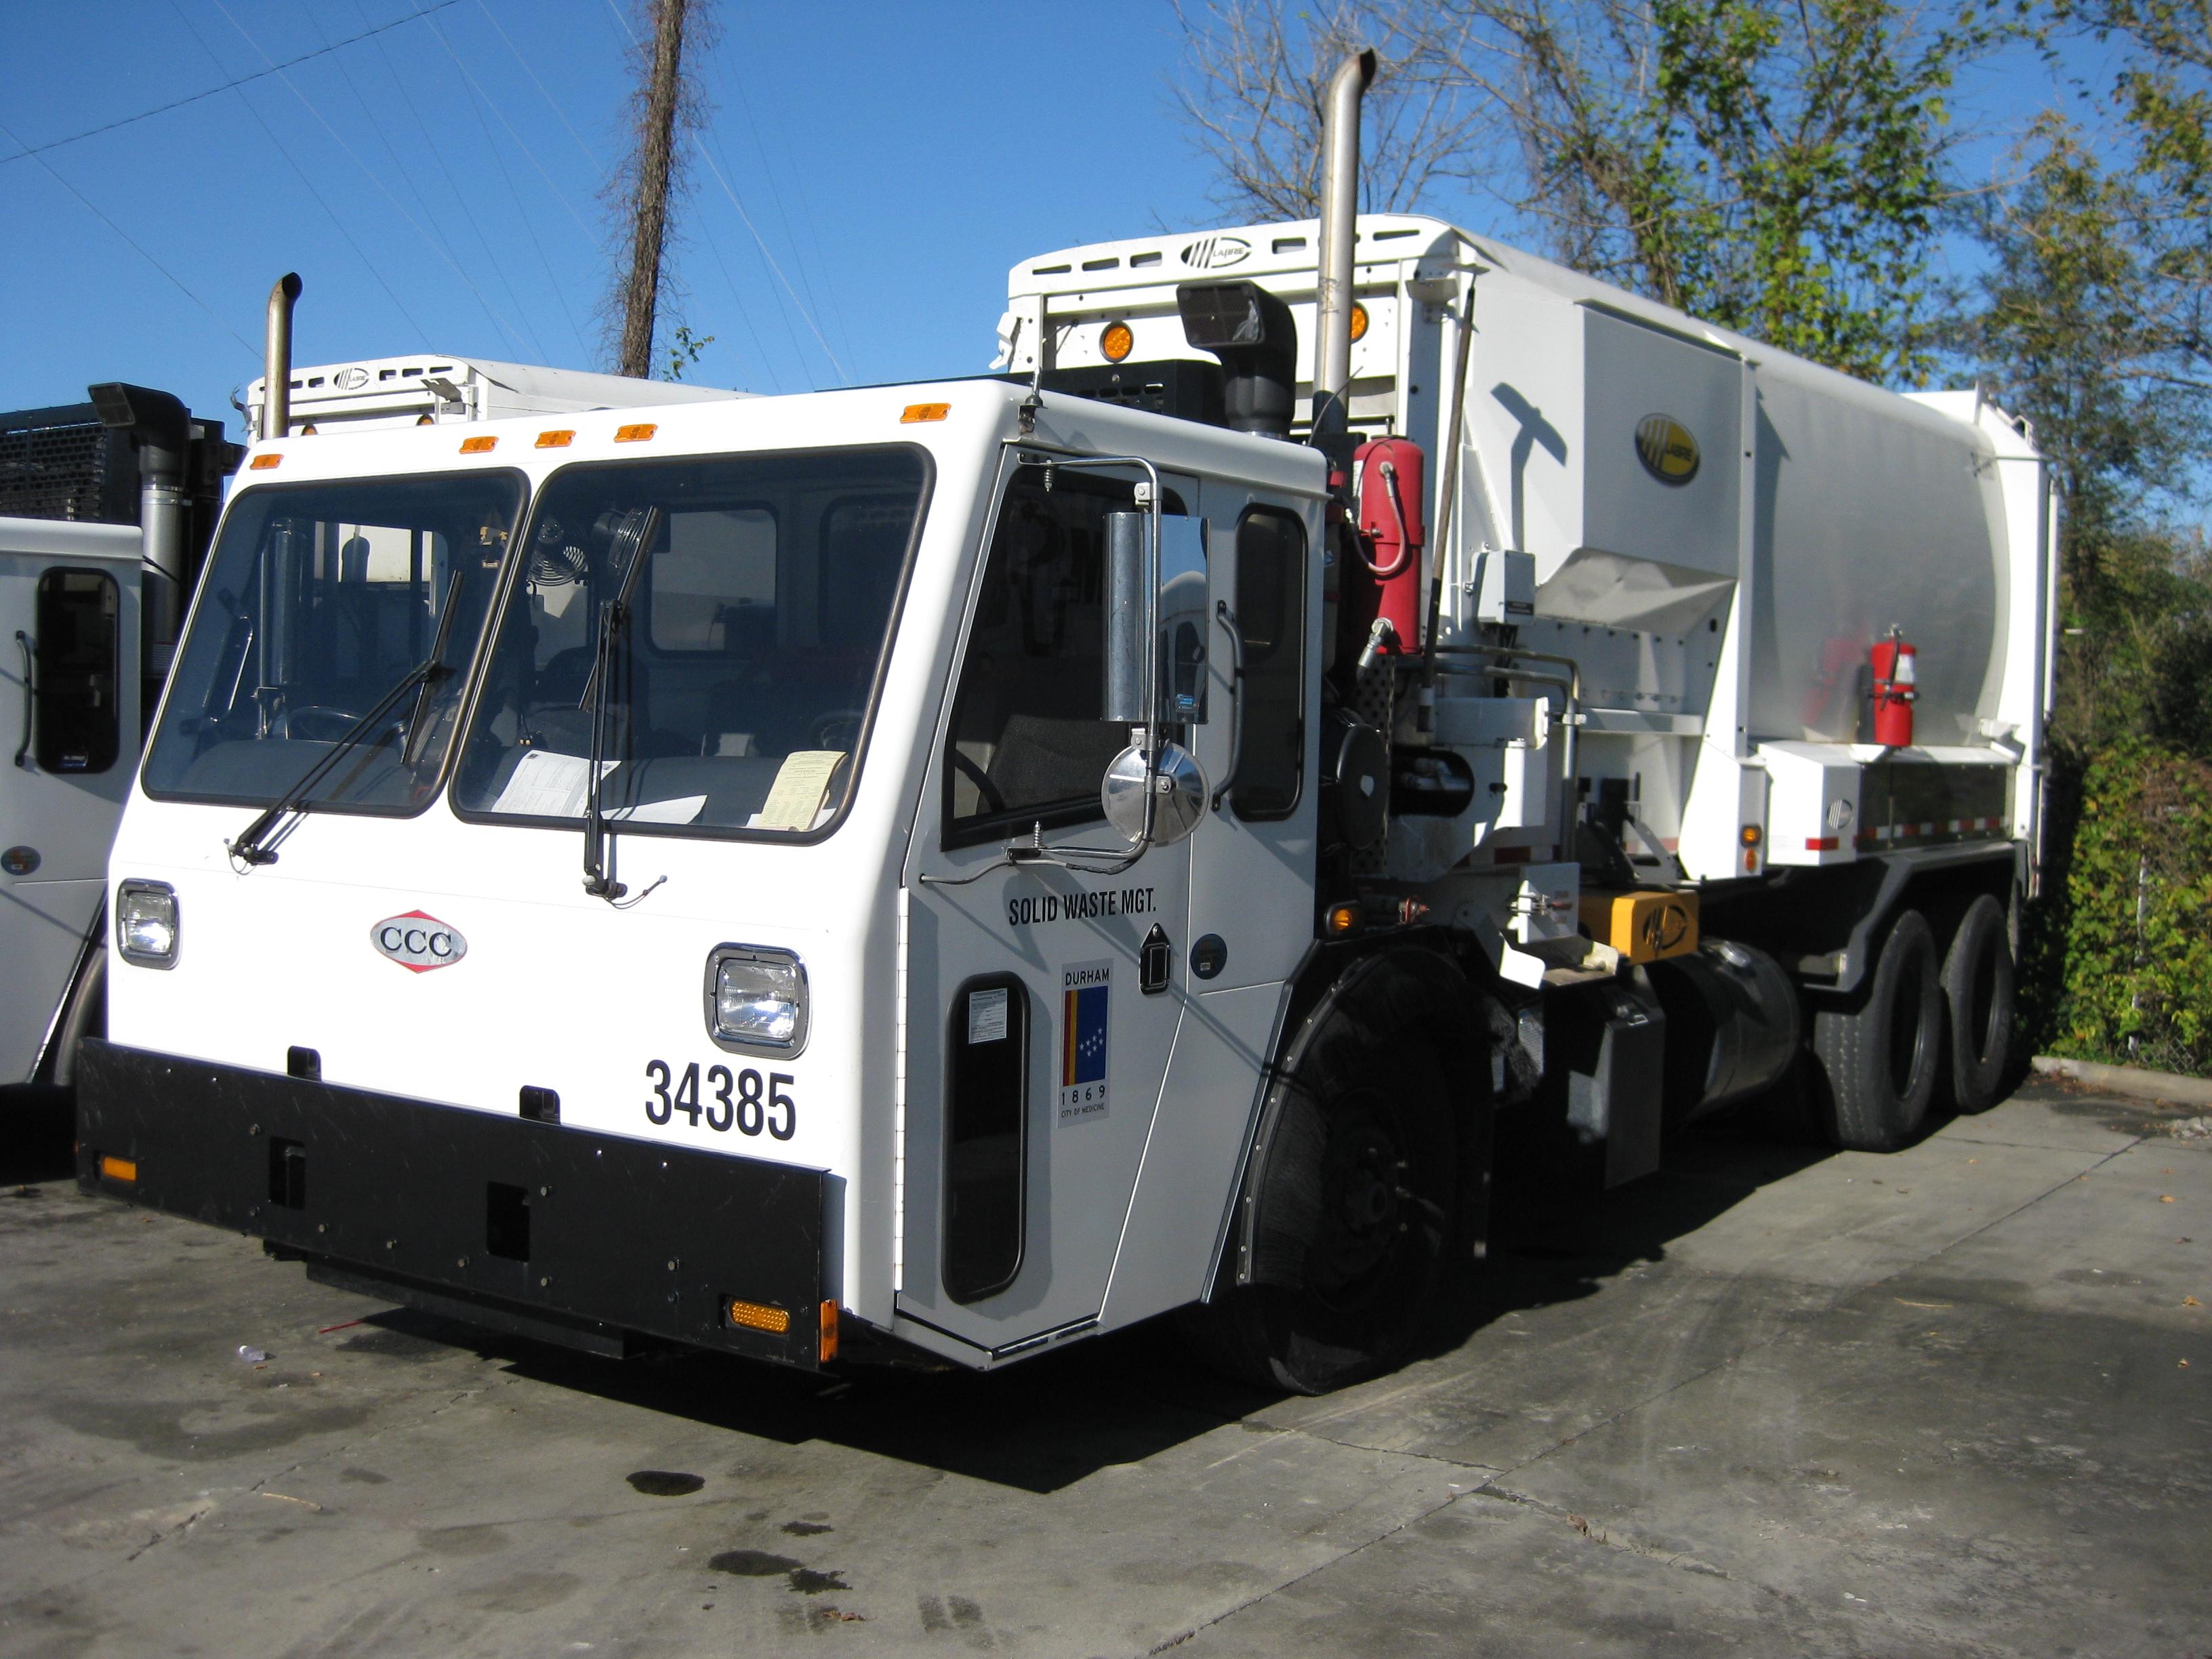 White garbage truck